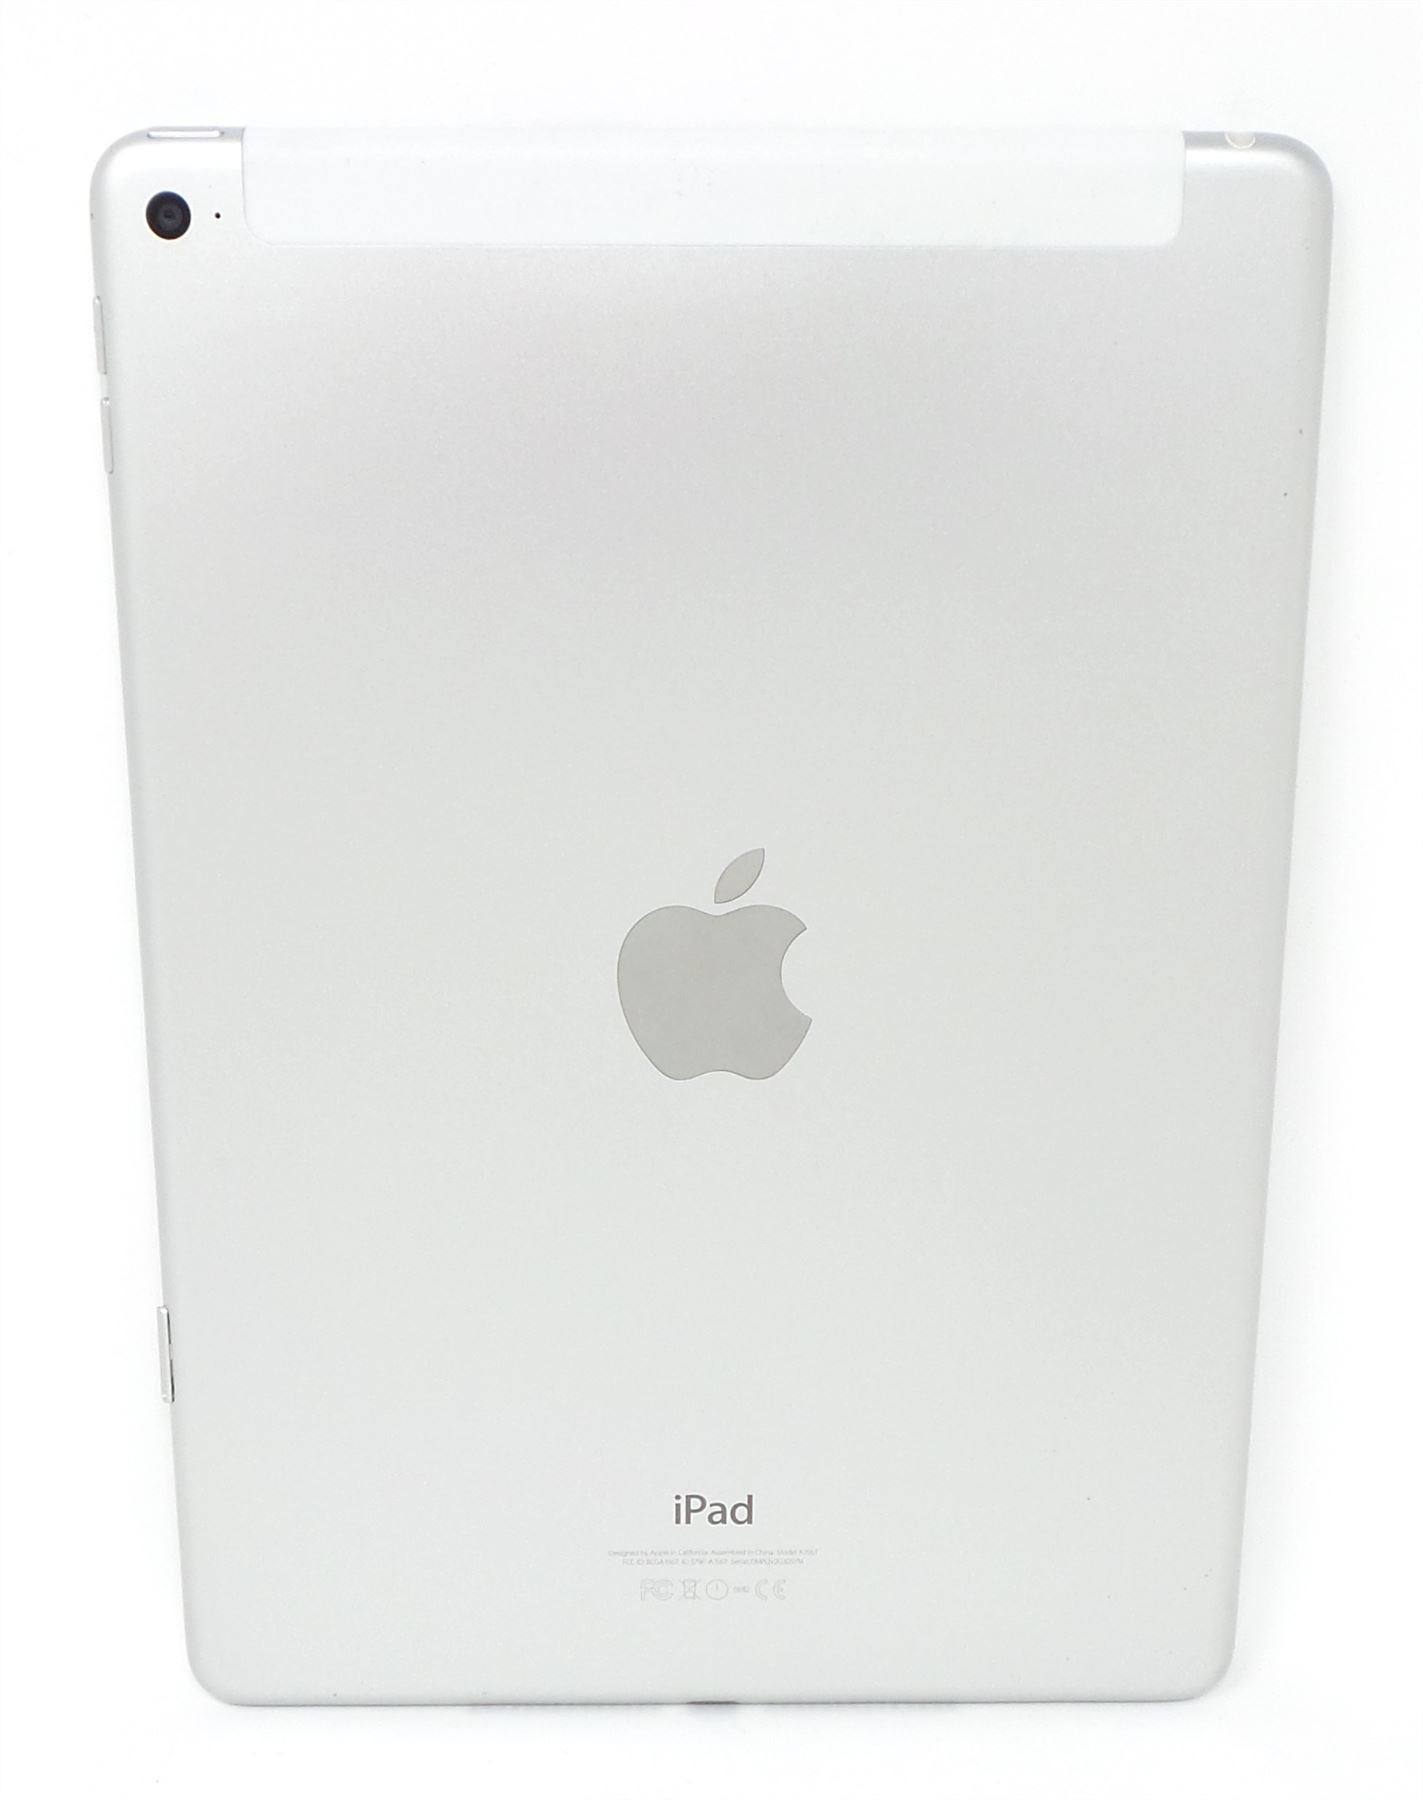 Cellular Gold Silver Gray Apple iPad Air 2nd Gen 9.7in 32GB 128GB Wi-Fi